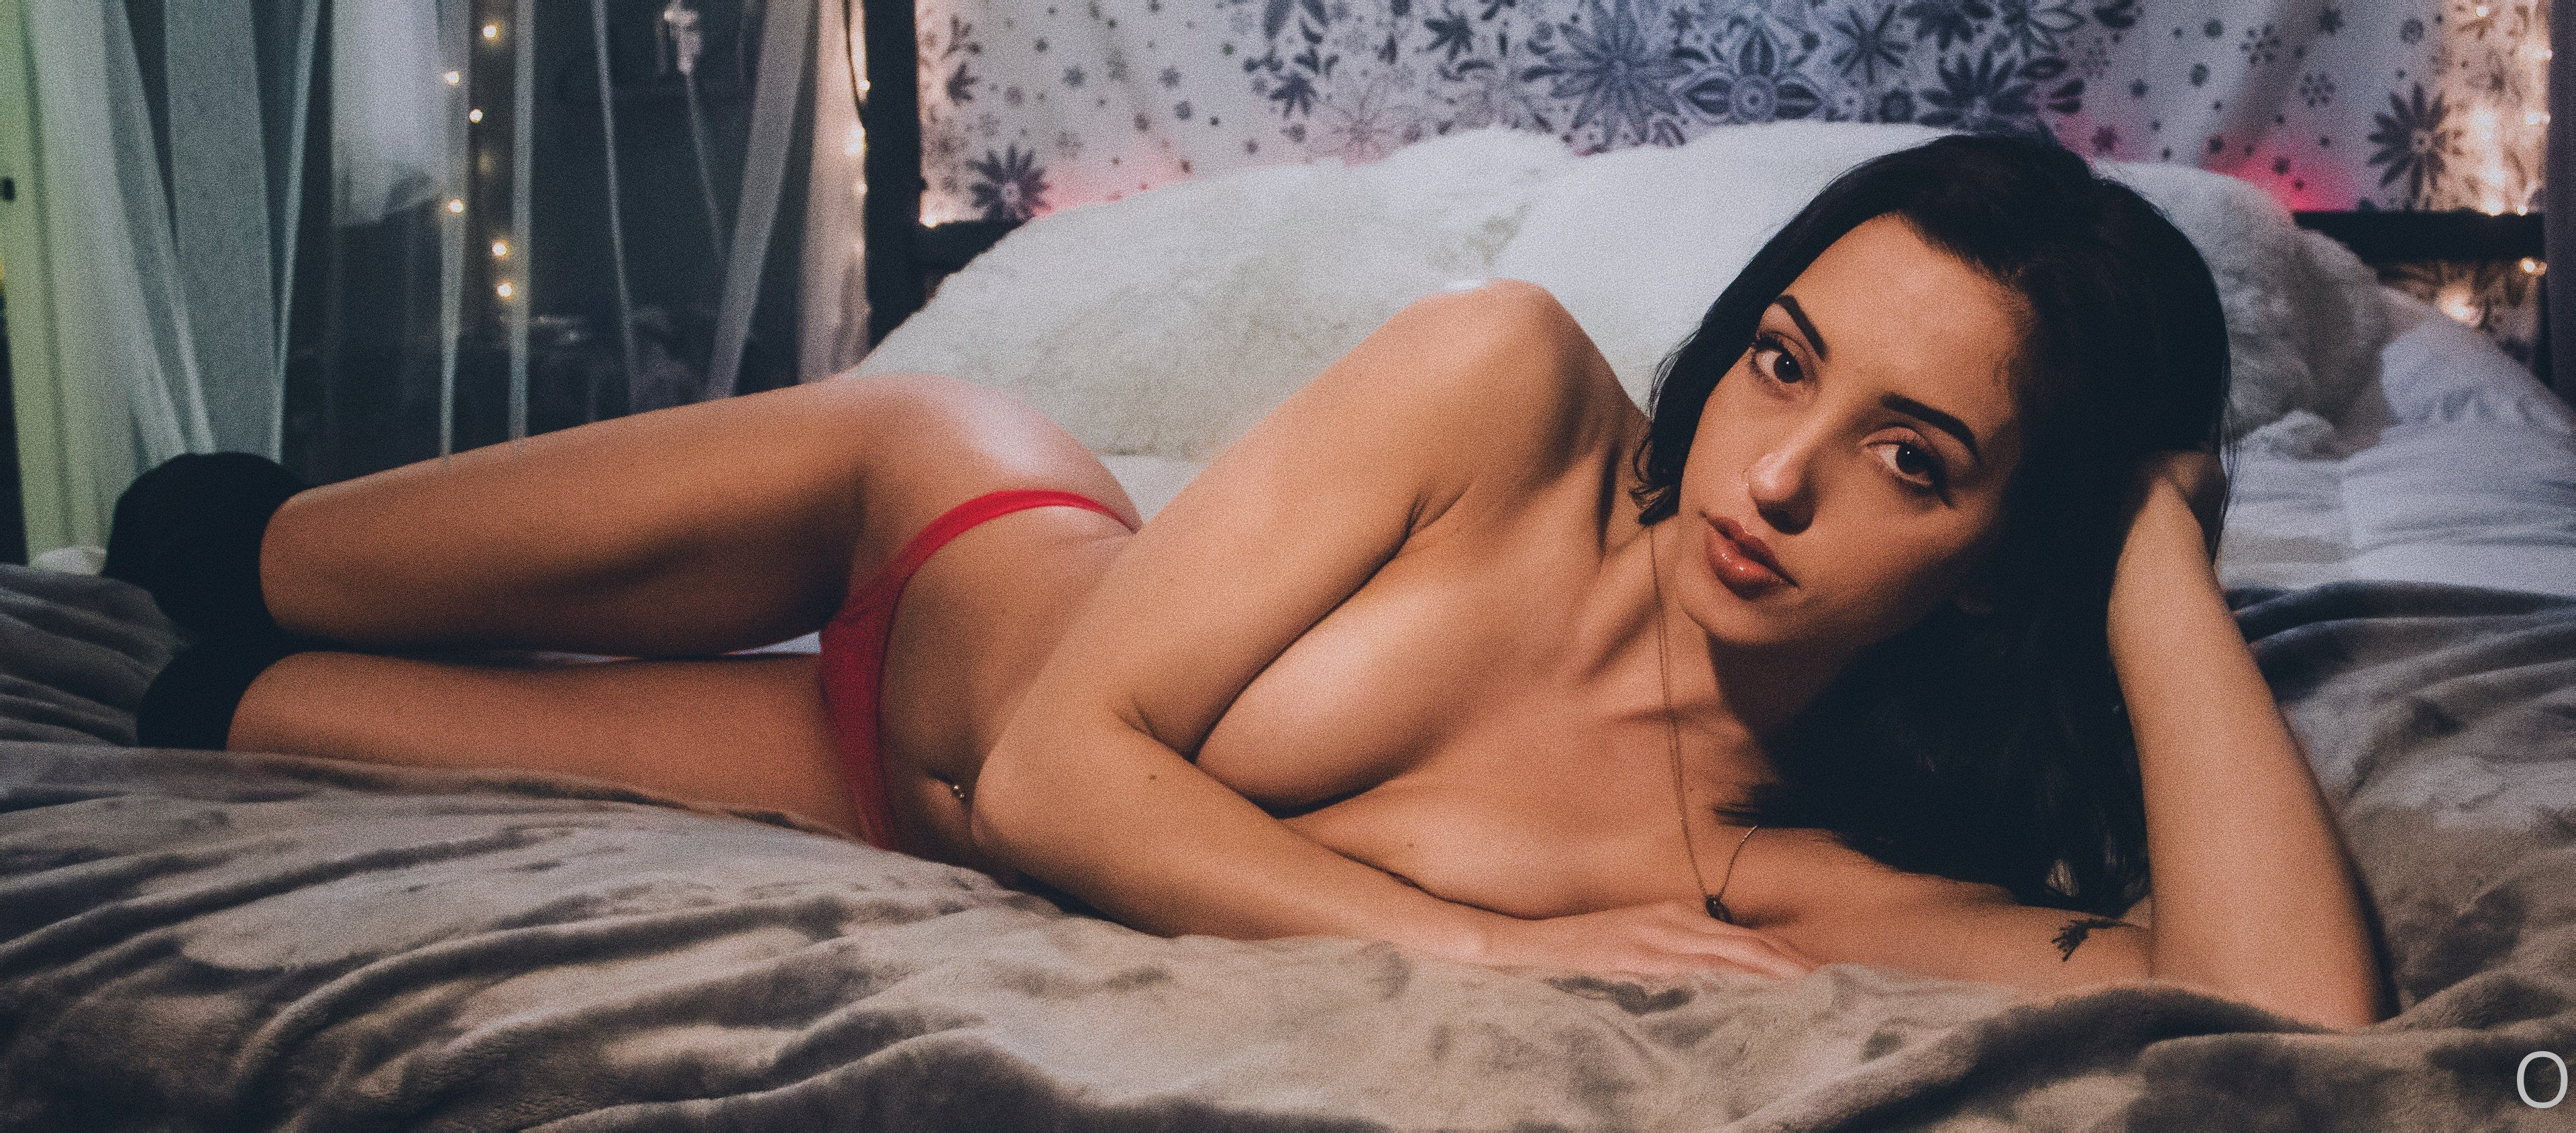 Karly Mergenthaler Nude Photos Onlyfans 0009